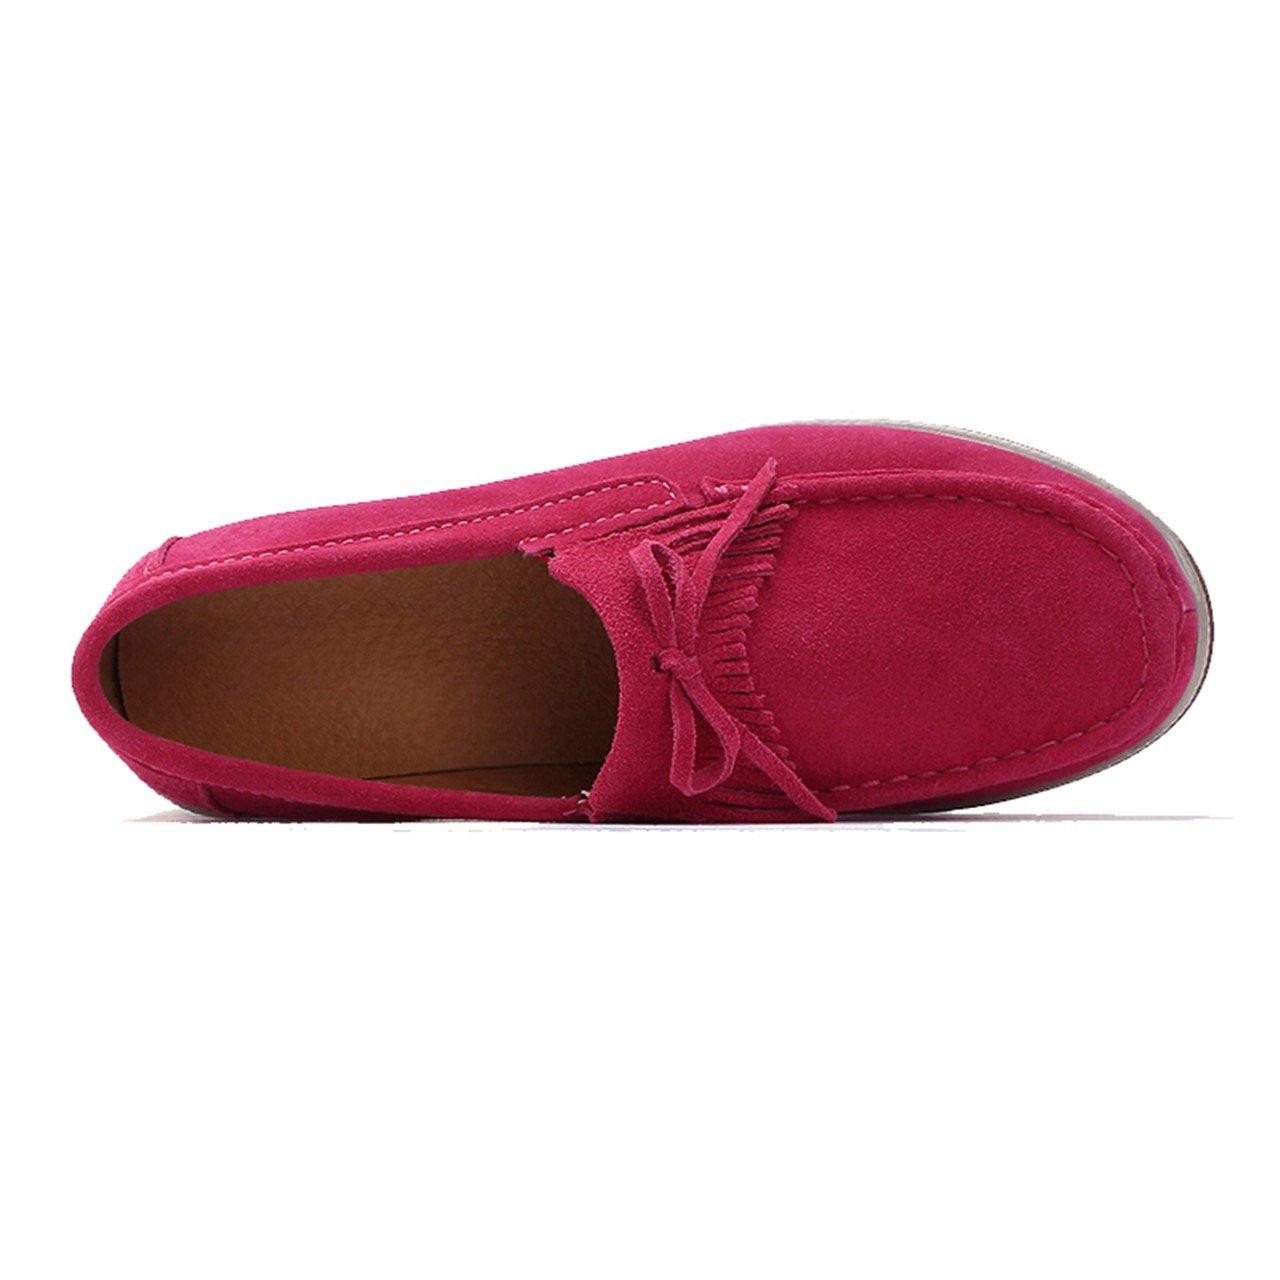 TRULAND Womens Suede Leather Slip-on Comfort Wedge Platform Fringe Moccasins//Hollowed Out